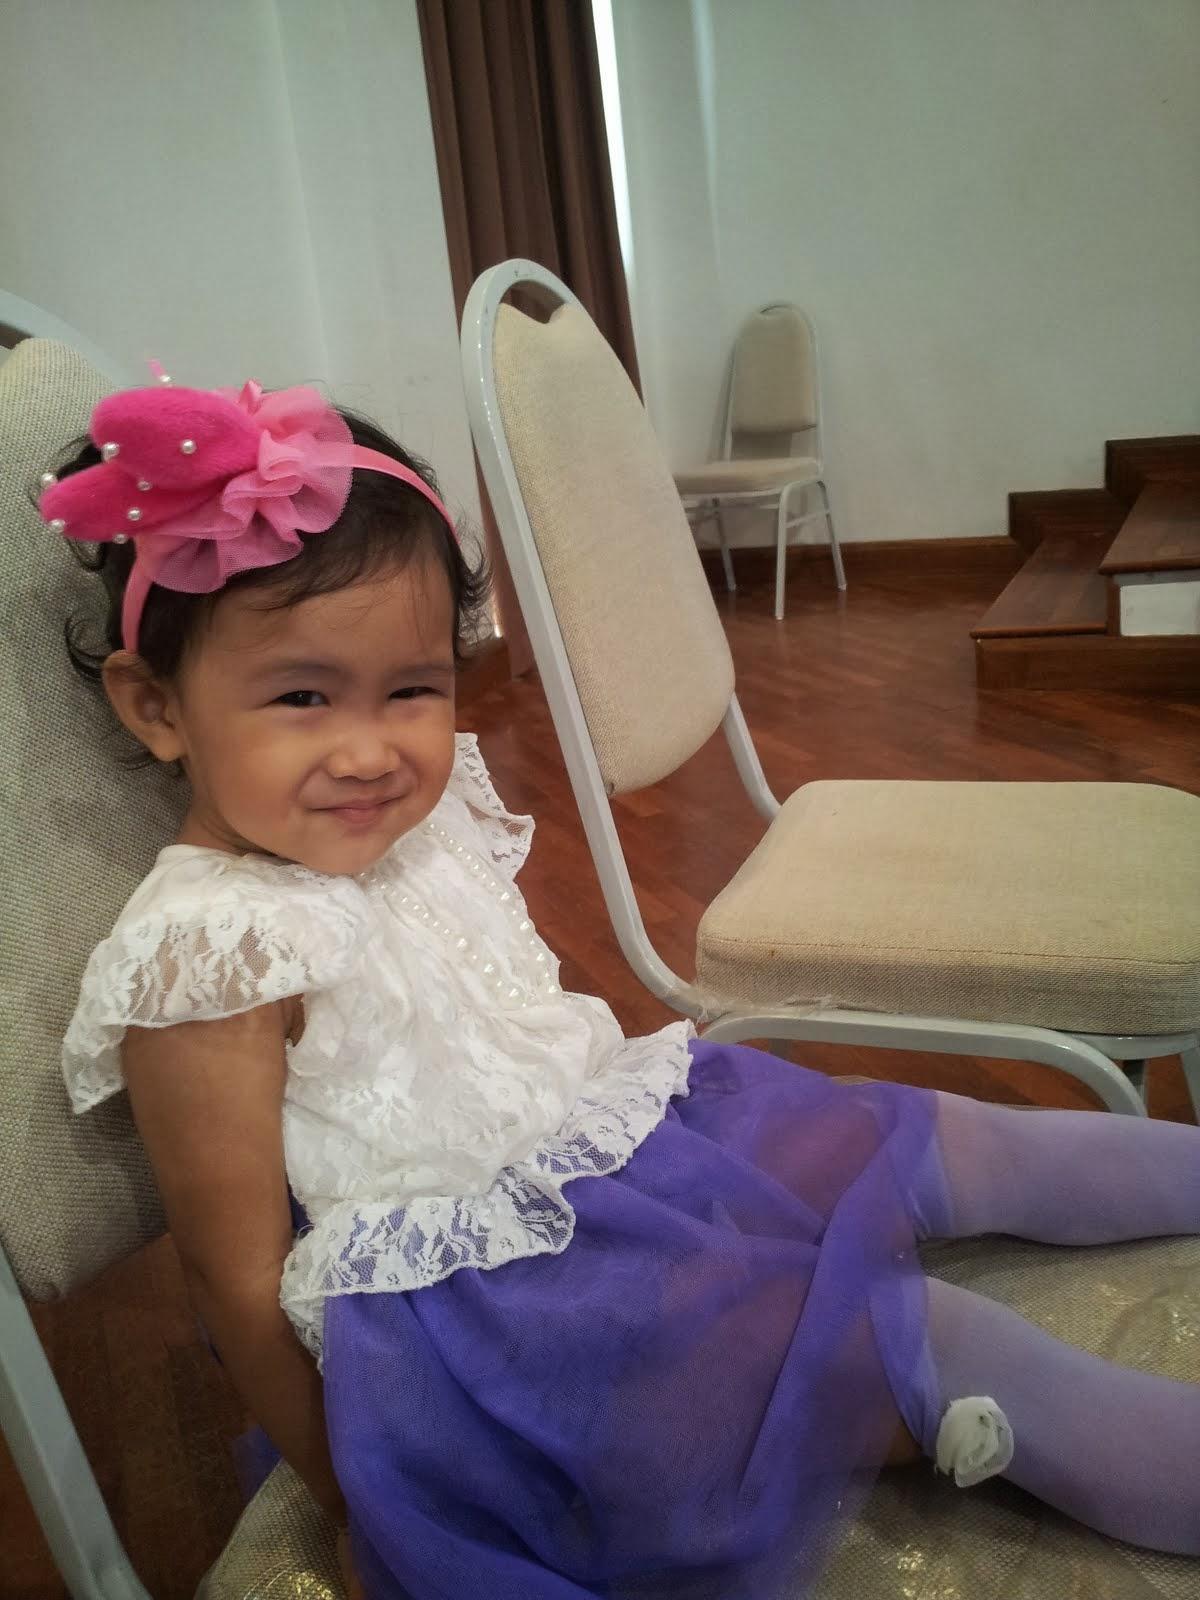 Seri Nur Iman 2 years